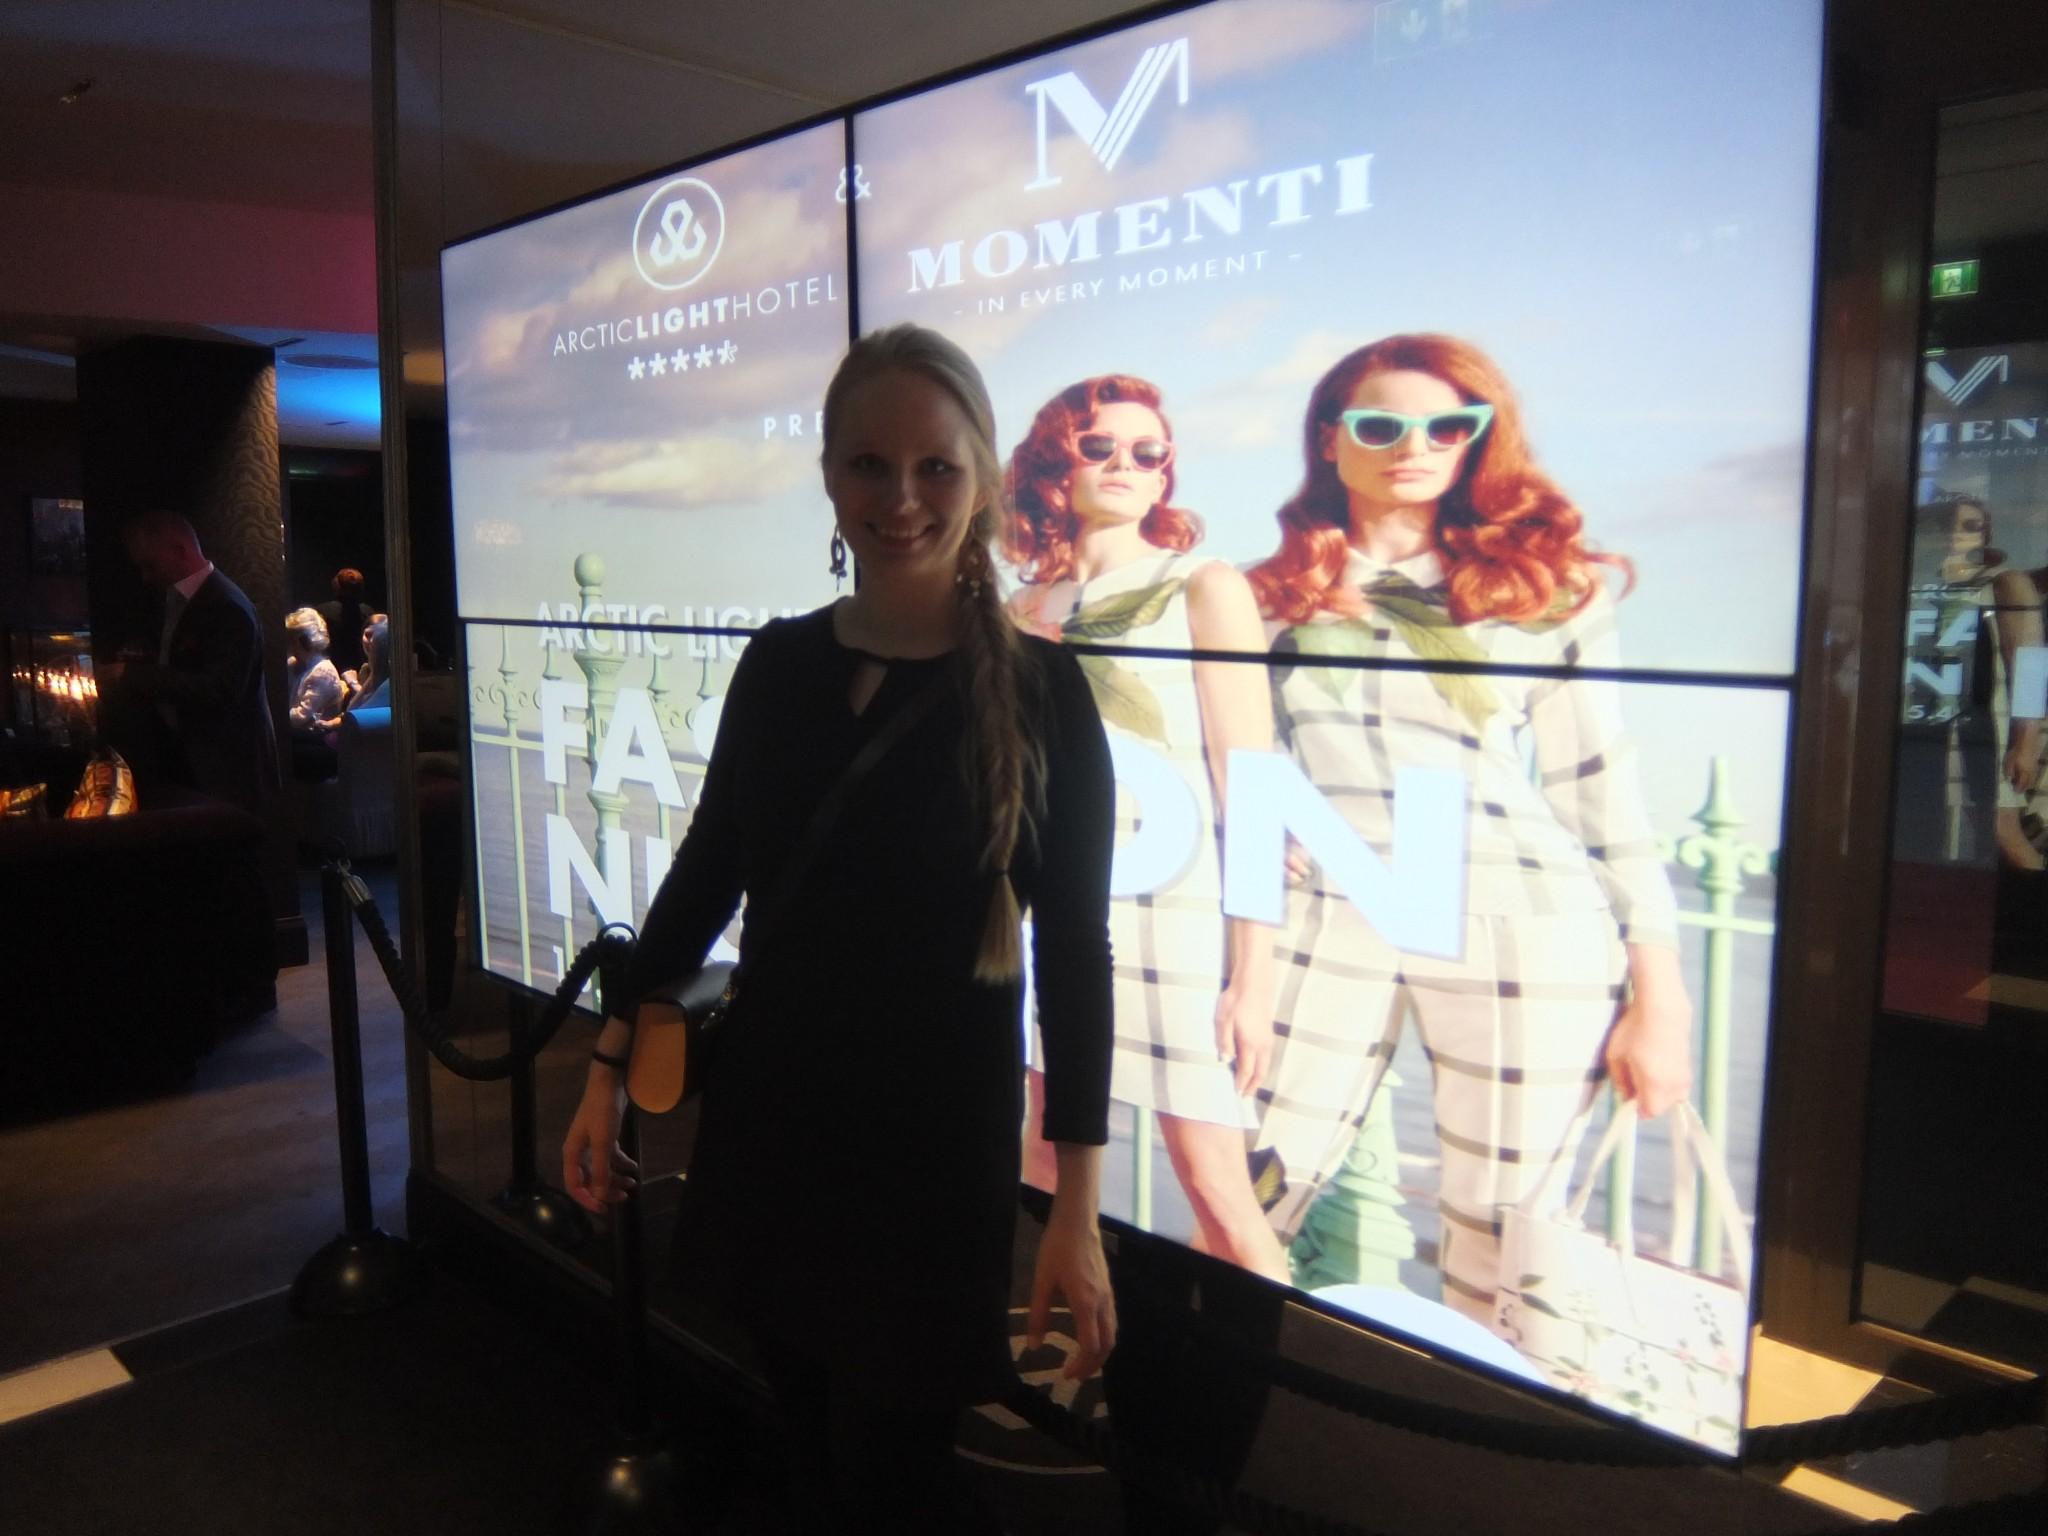 Arctic Light Hotel Fashion Night Momenti (370)